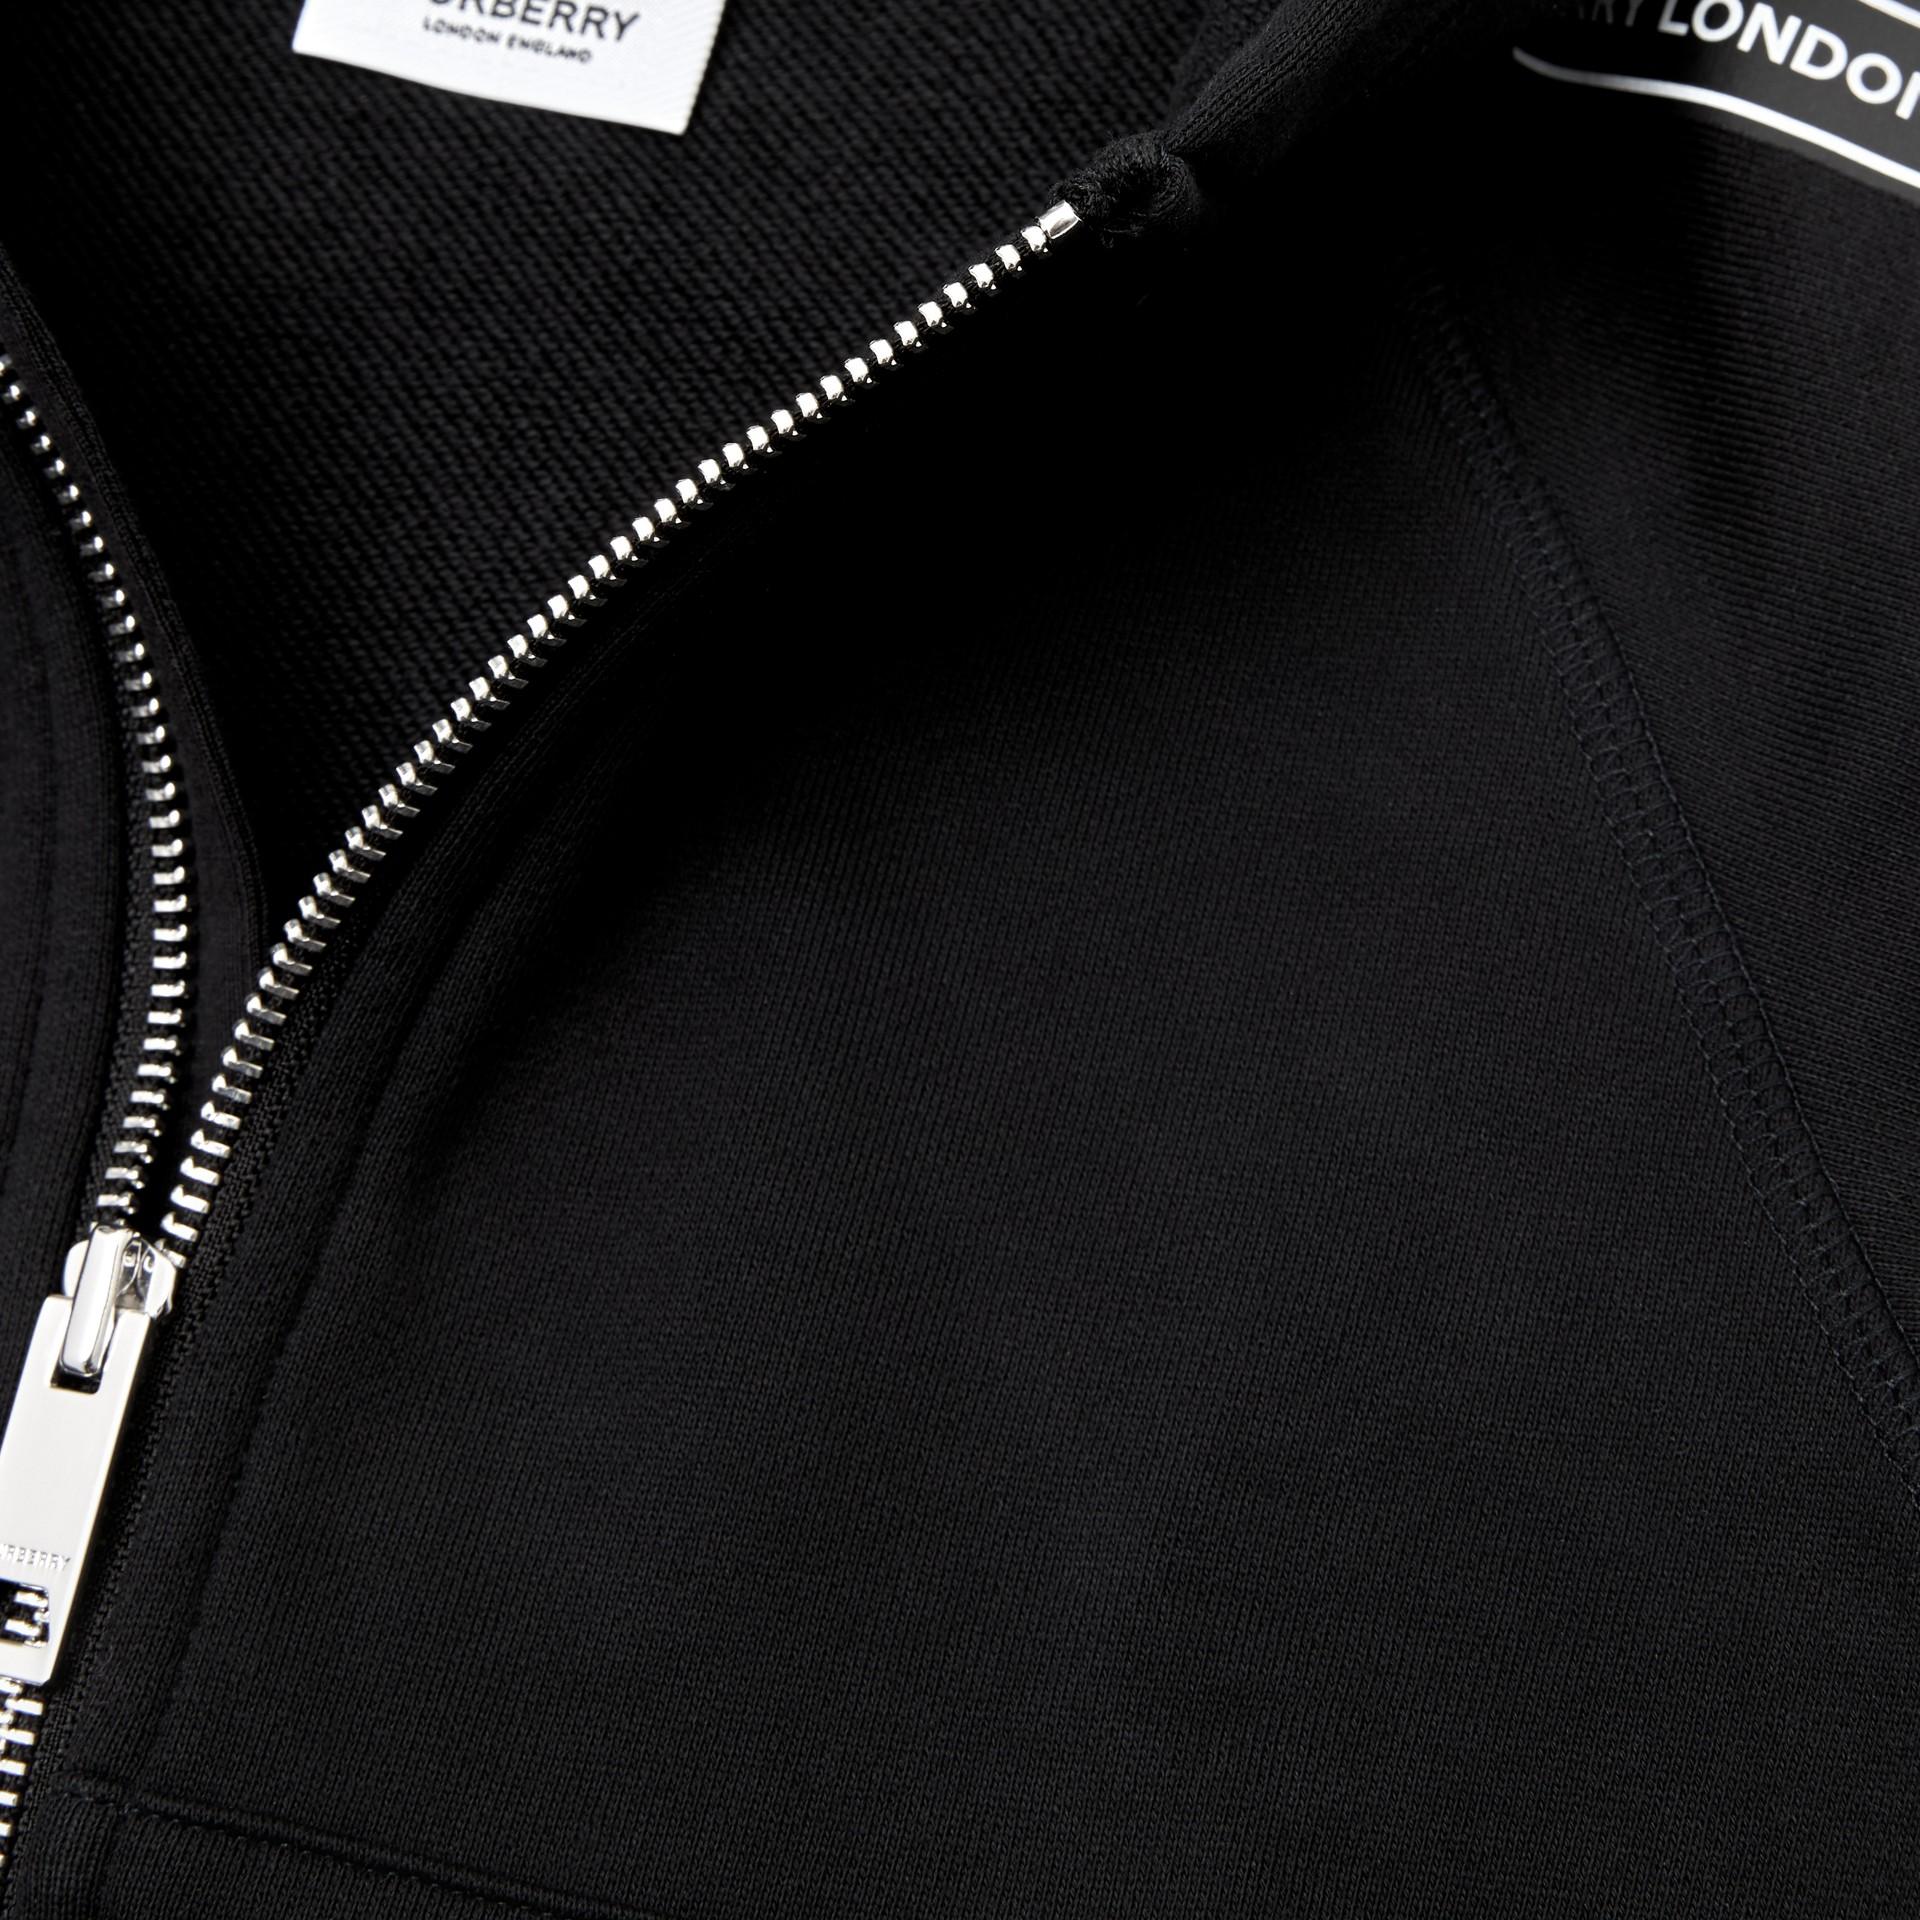 Logo Tape Cotton Hooded Top in Black - Children | Burberry Australia - gallery image 1